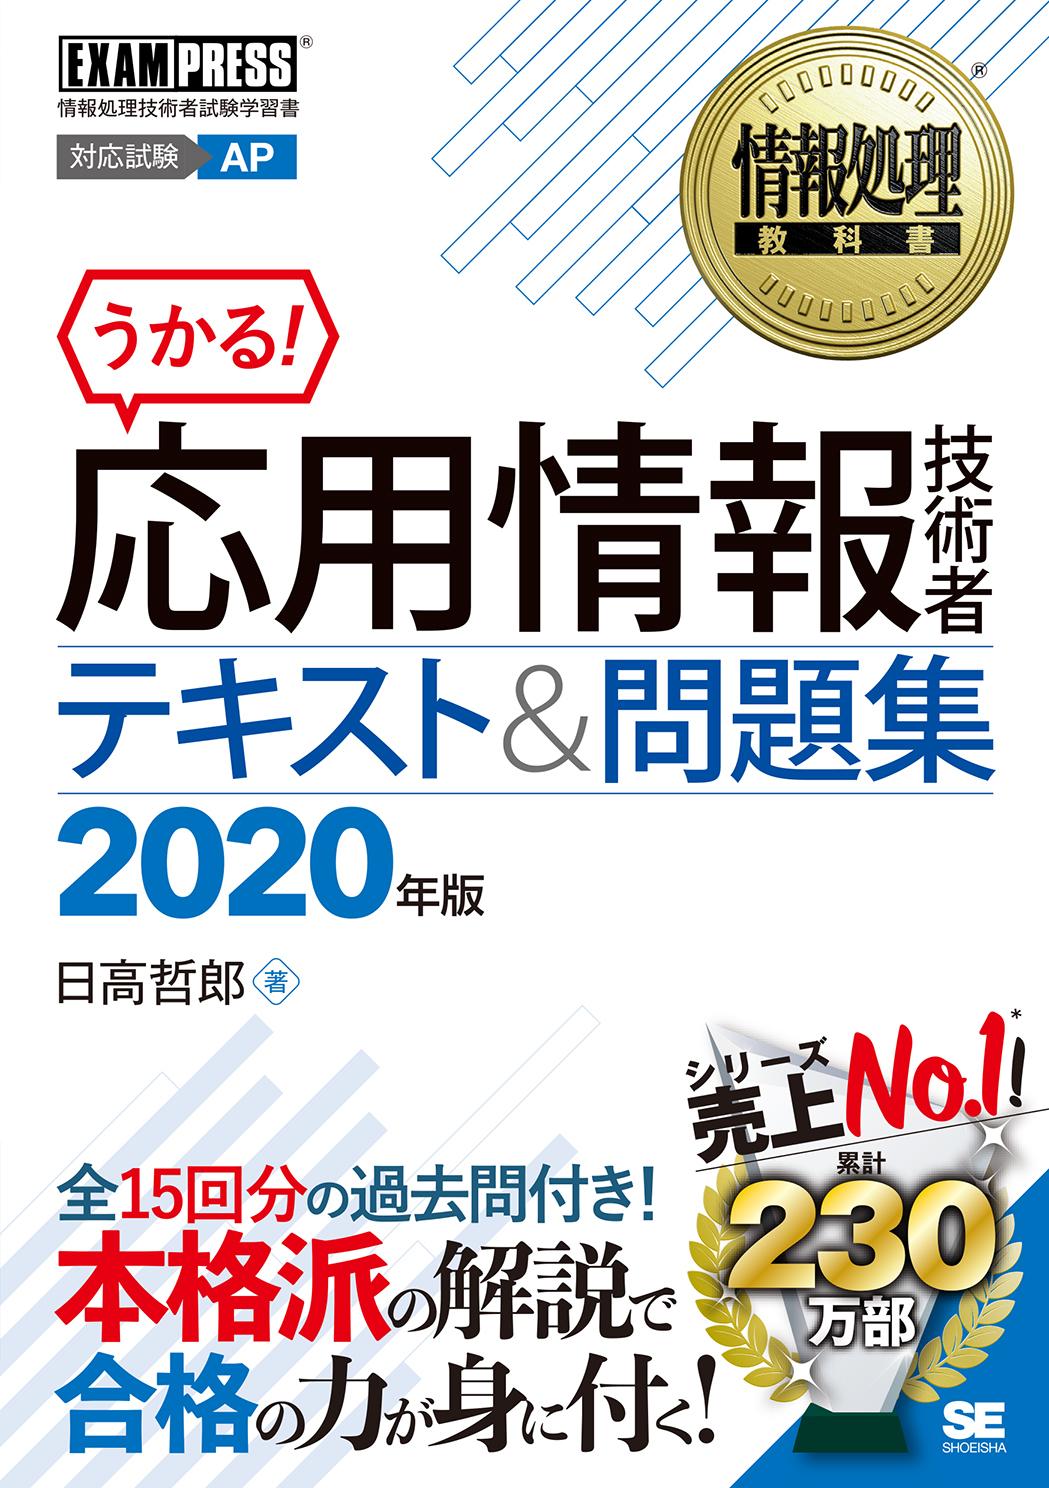 応用情報技術者 テキスト&問題集 2020年版(翔泳社)